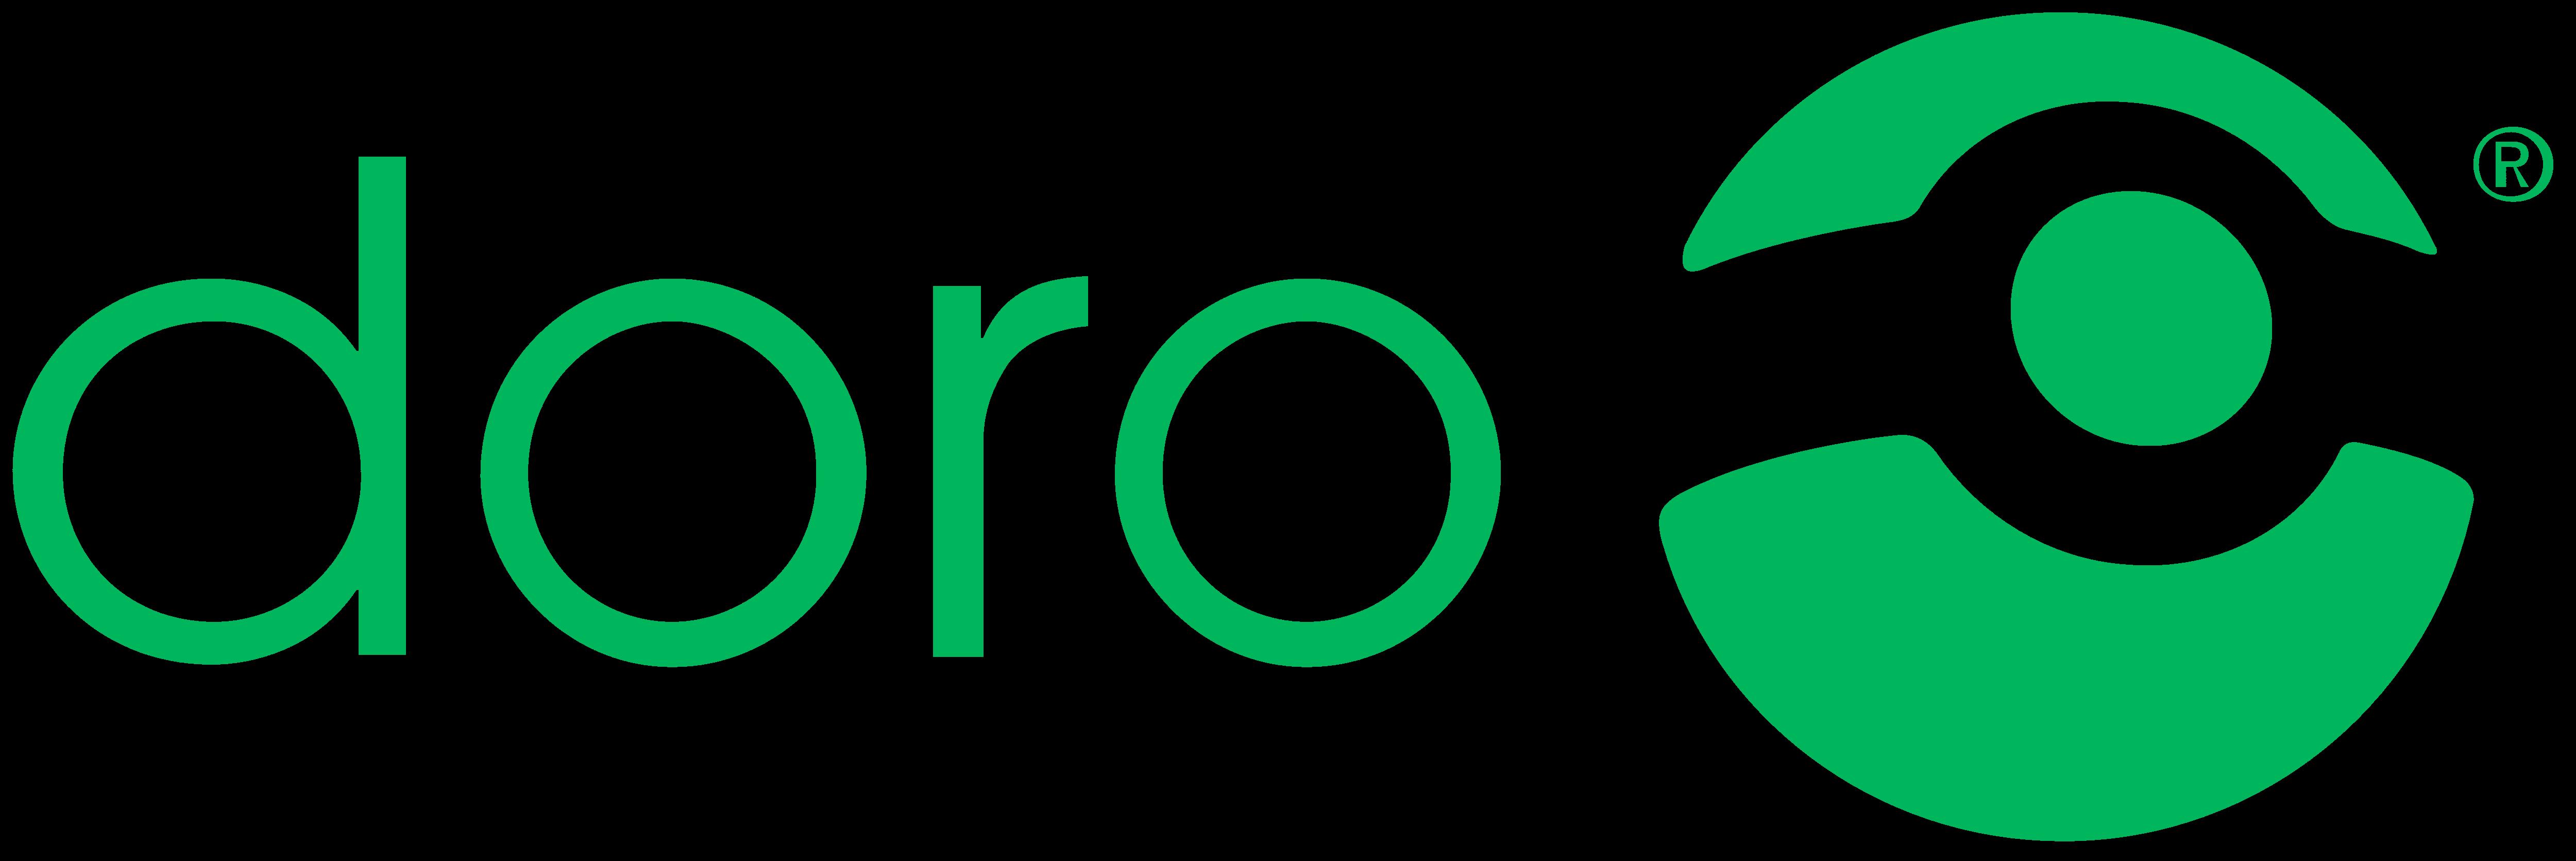 Doro – Logos Download